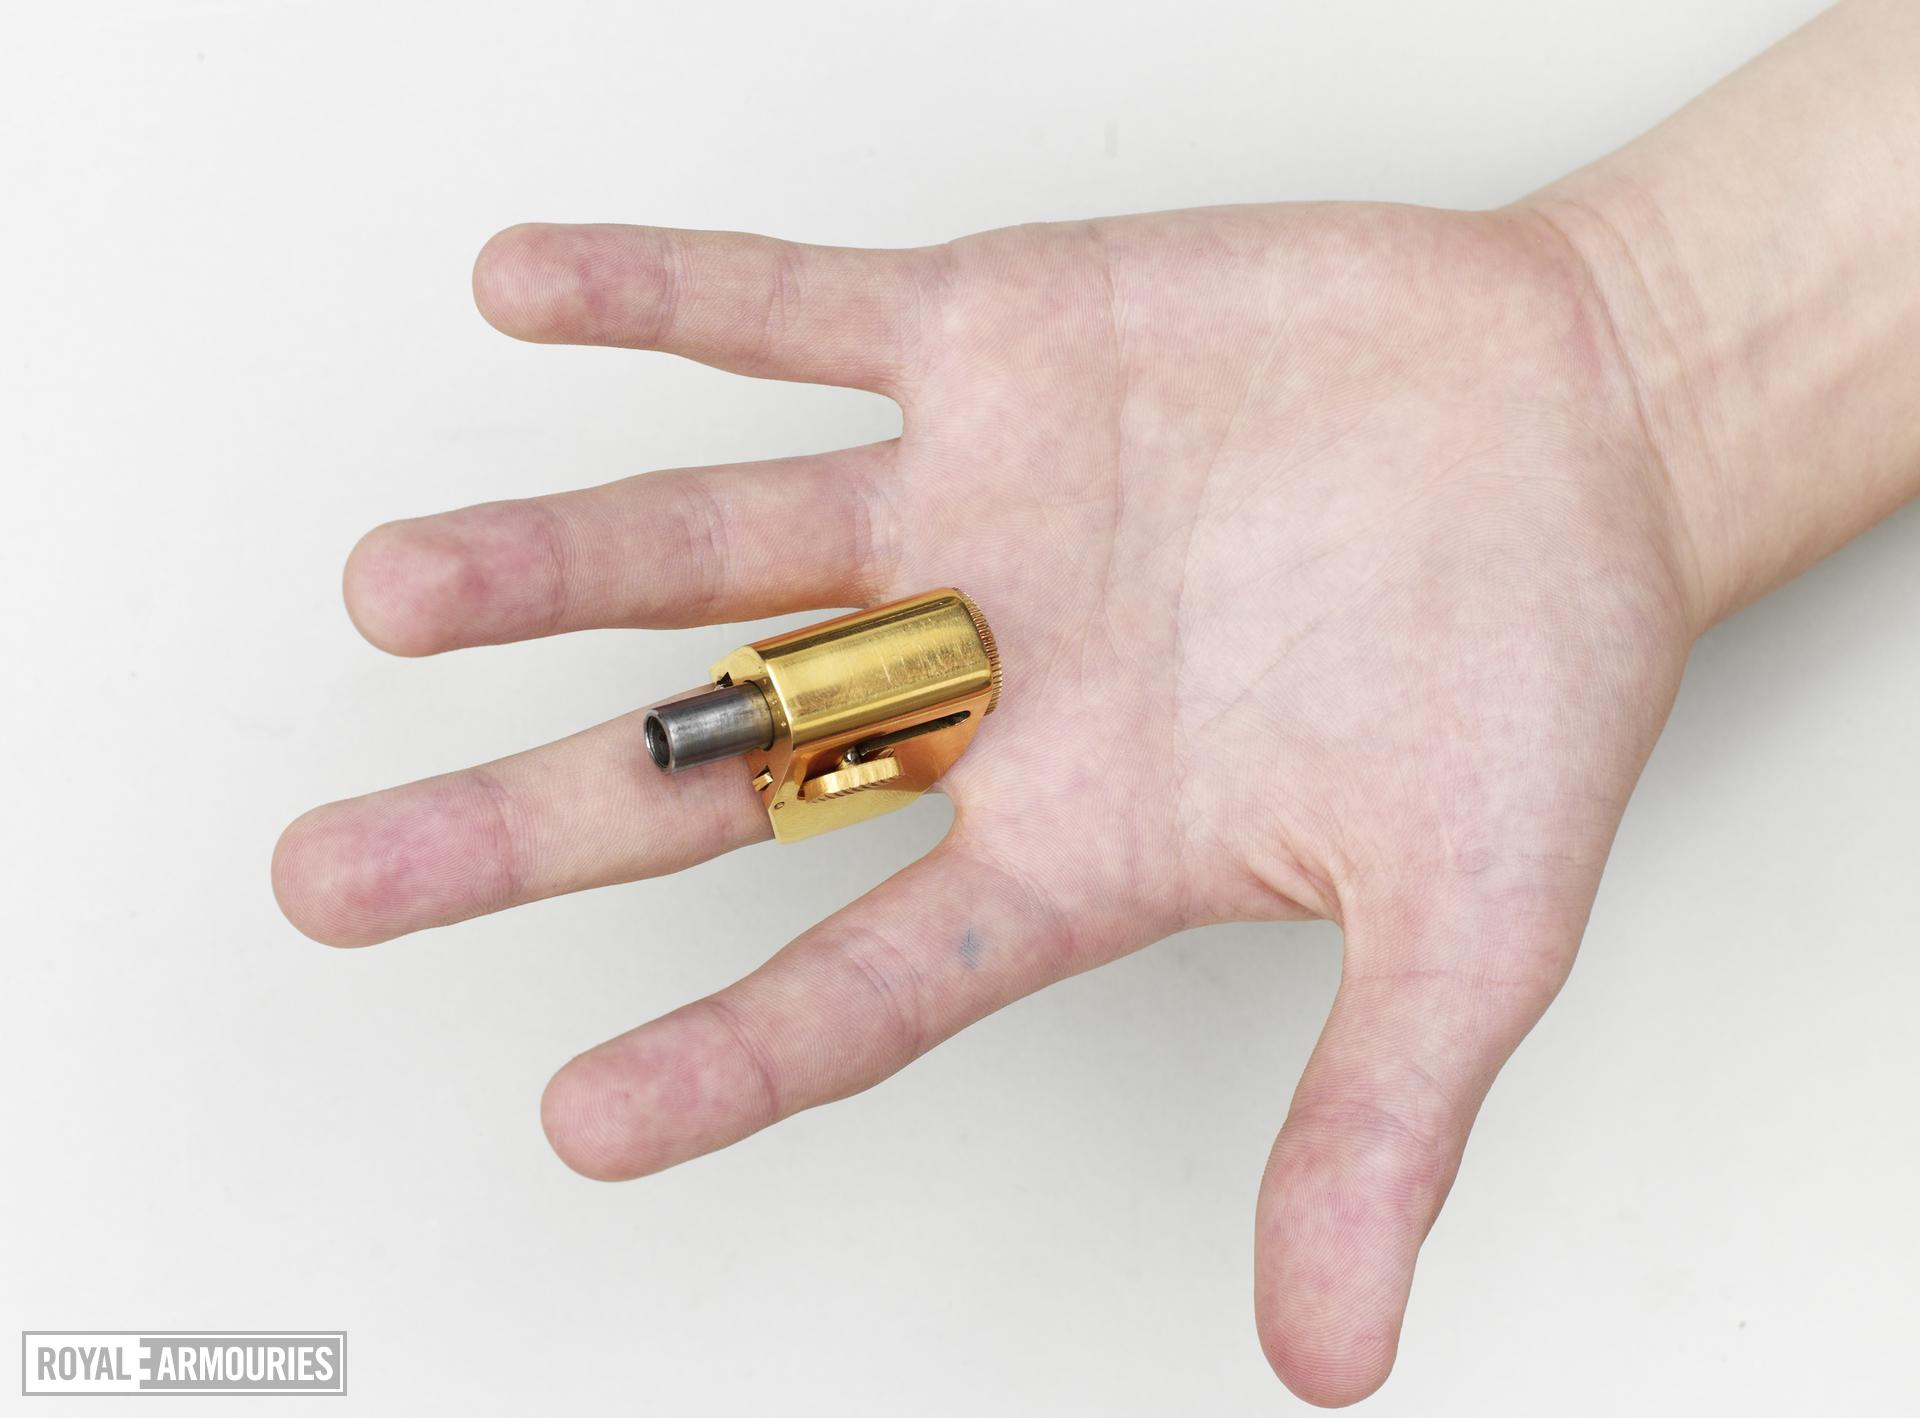 Percussion ring pistol - Le Petit Protecteur Cased